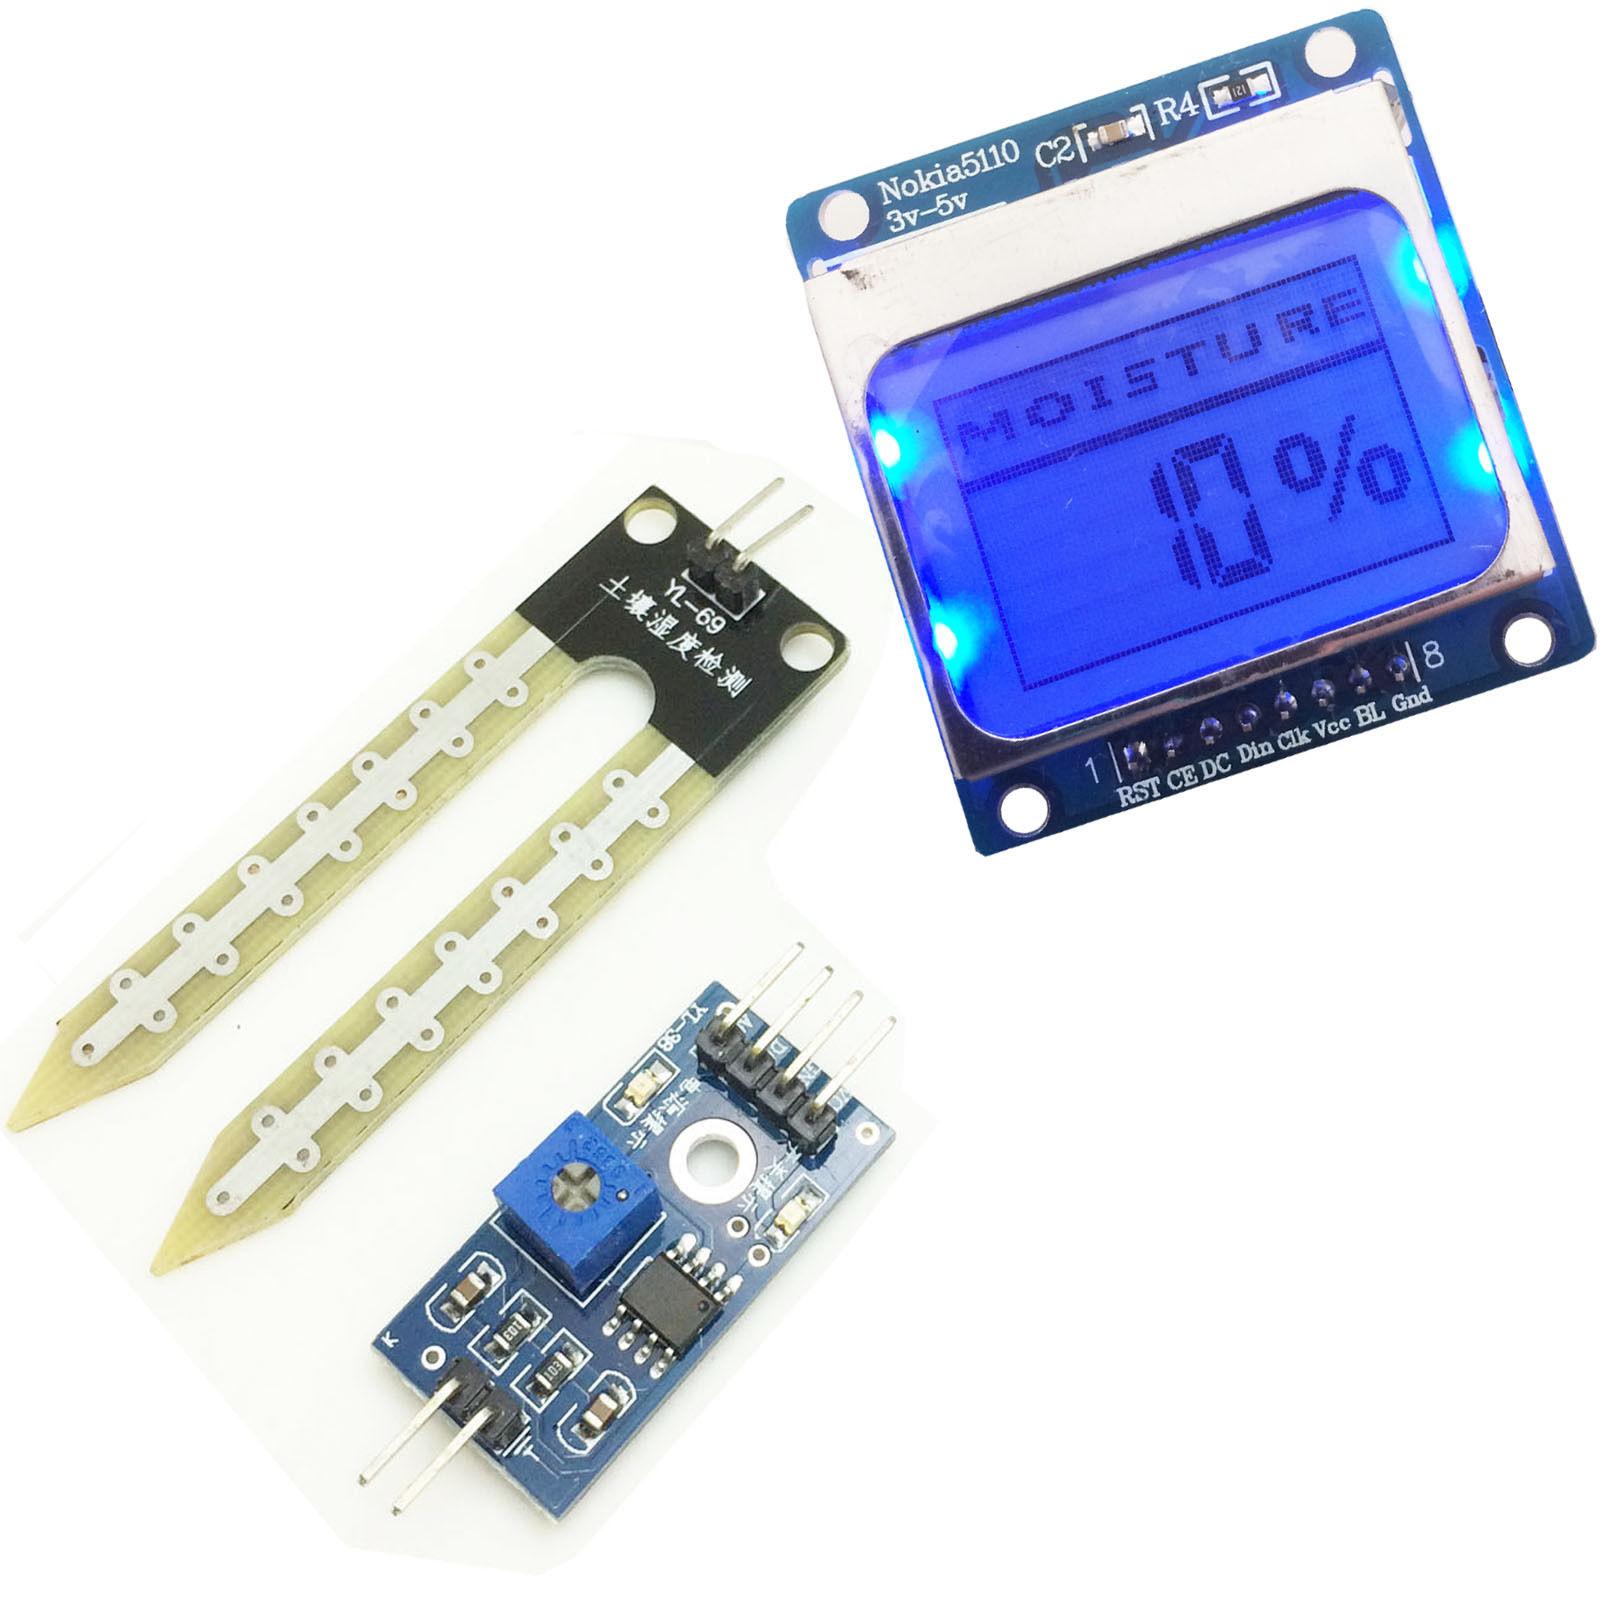 7de70ec8b975f6 Industrial Temperature Sensors  ebay  Electronics Raspberry, Raspberries